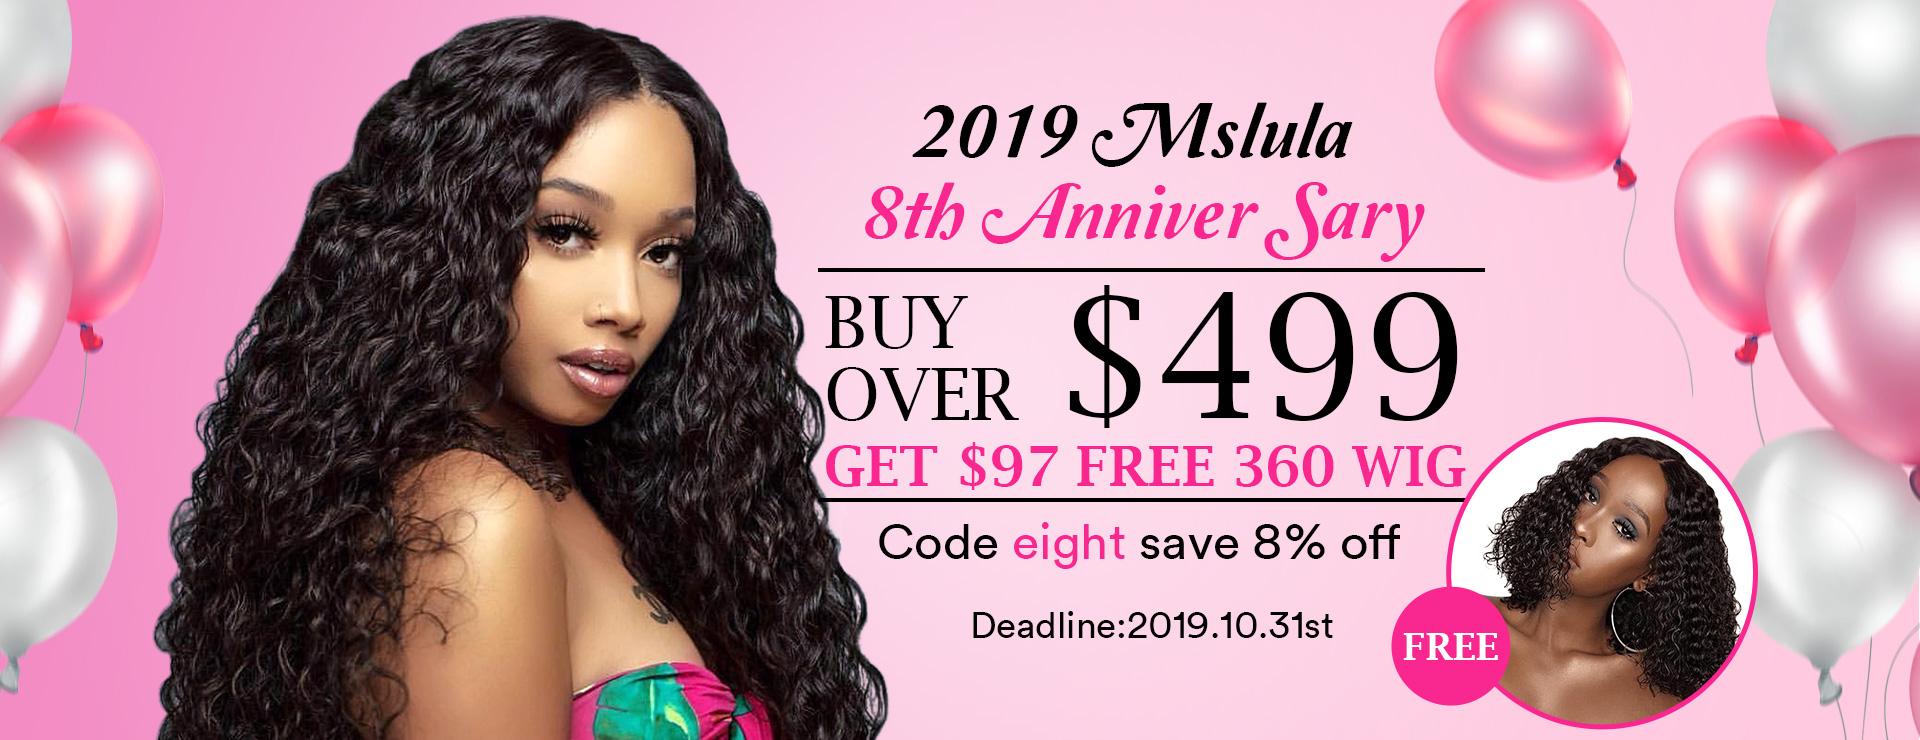 mslula new site